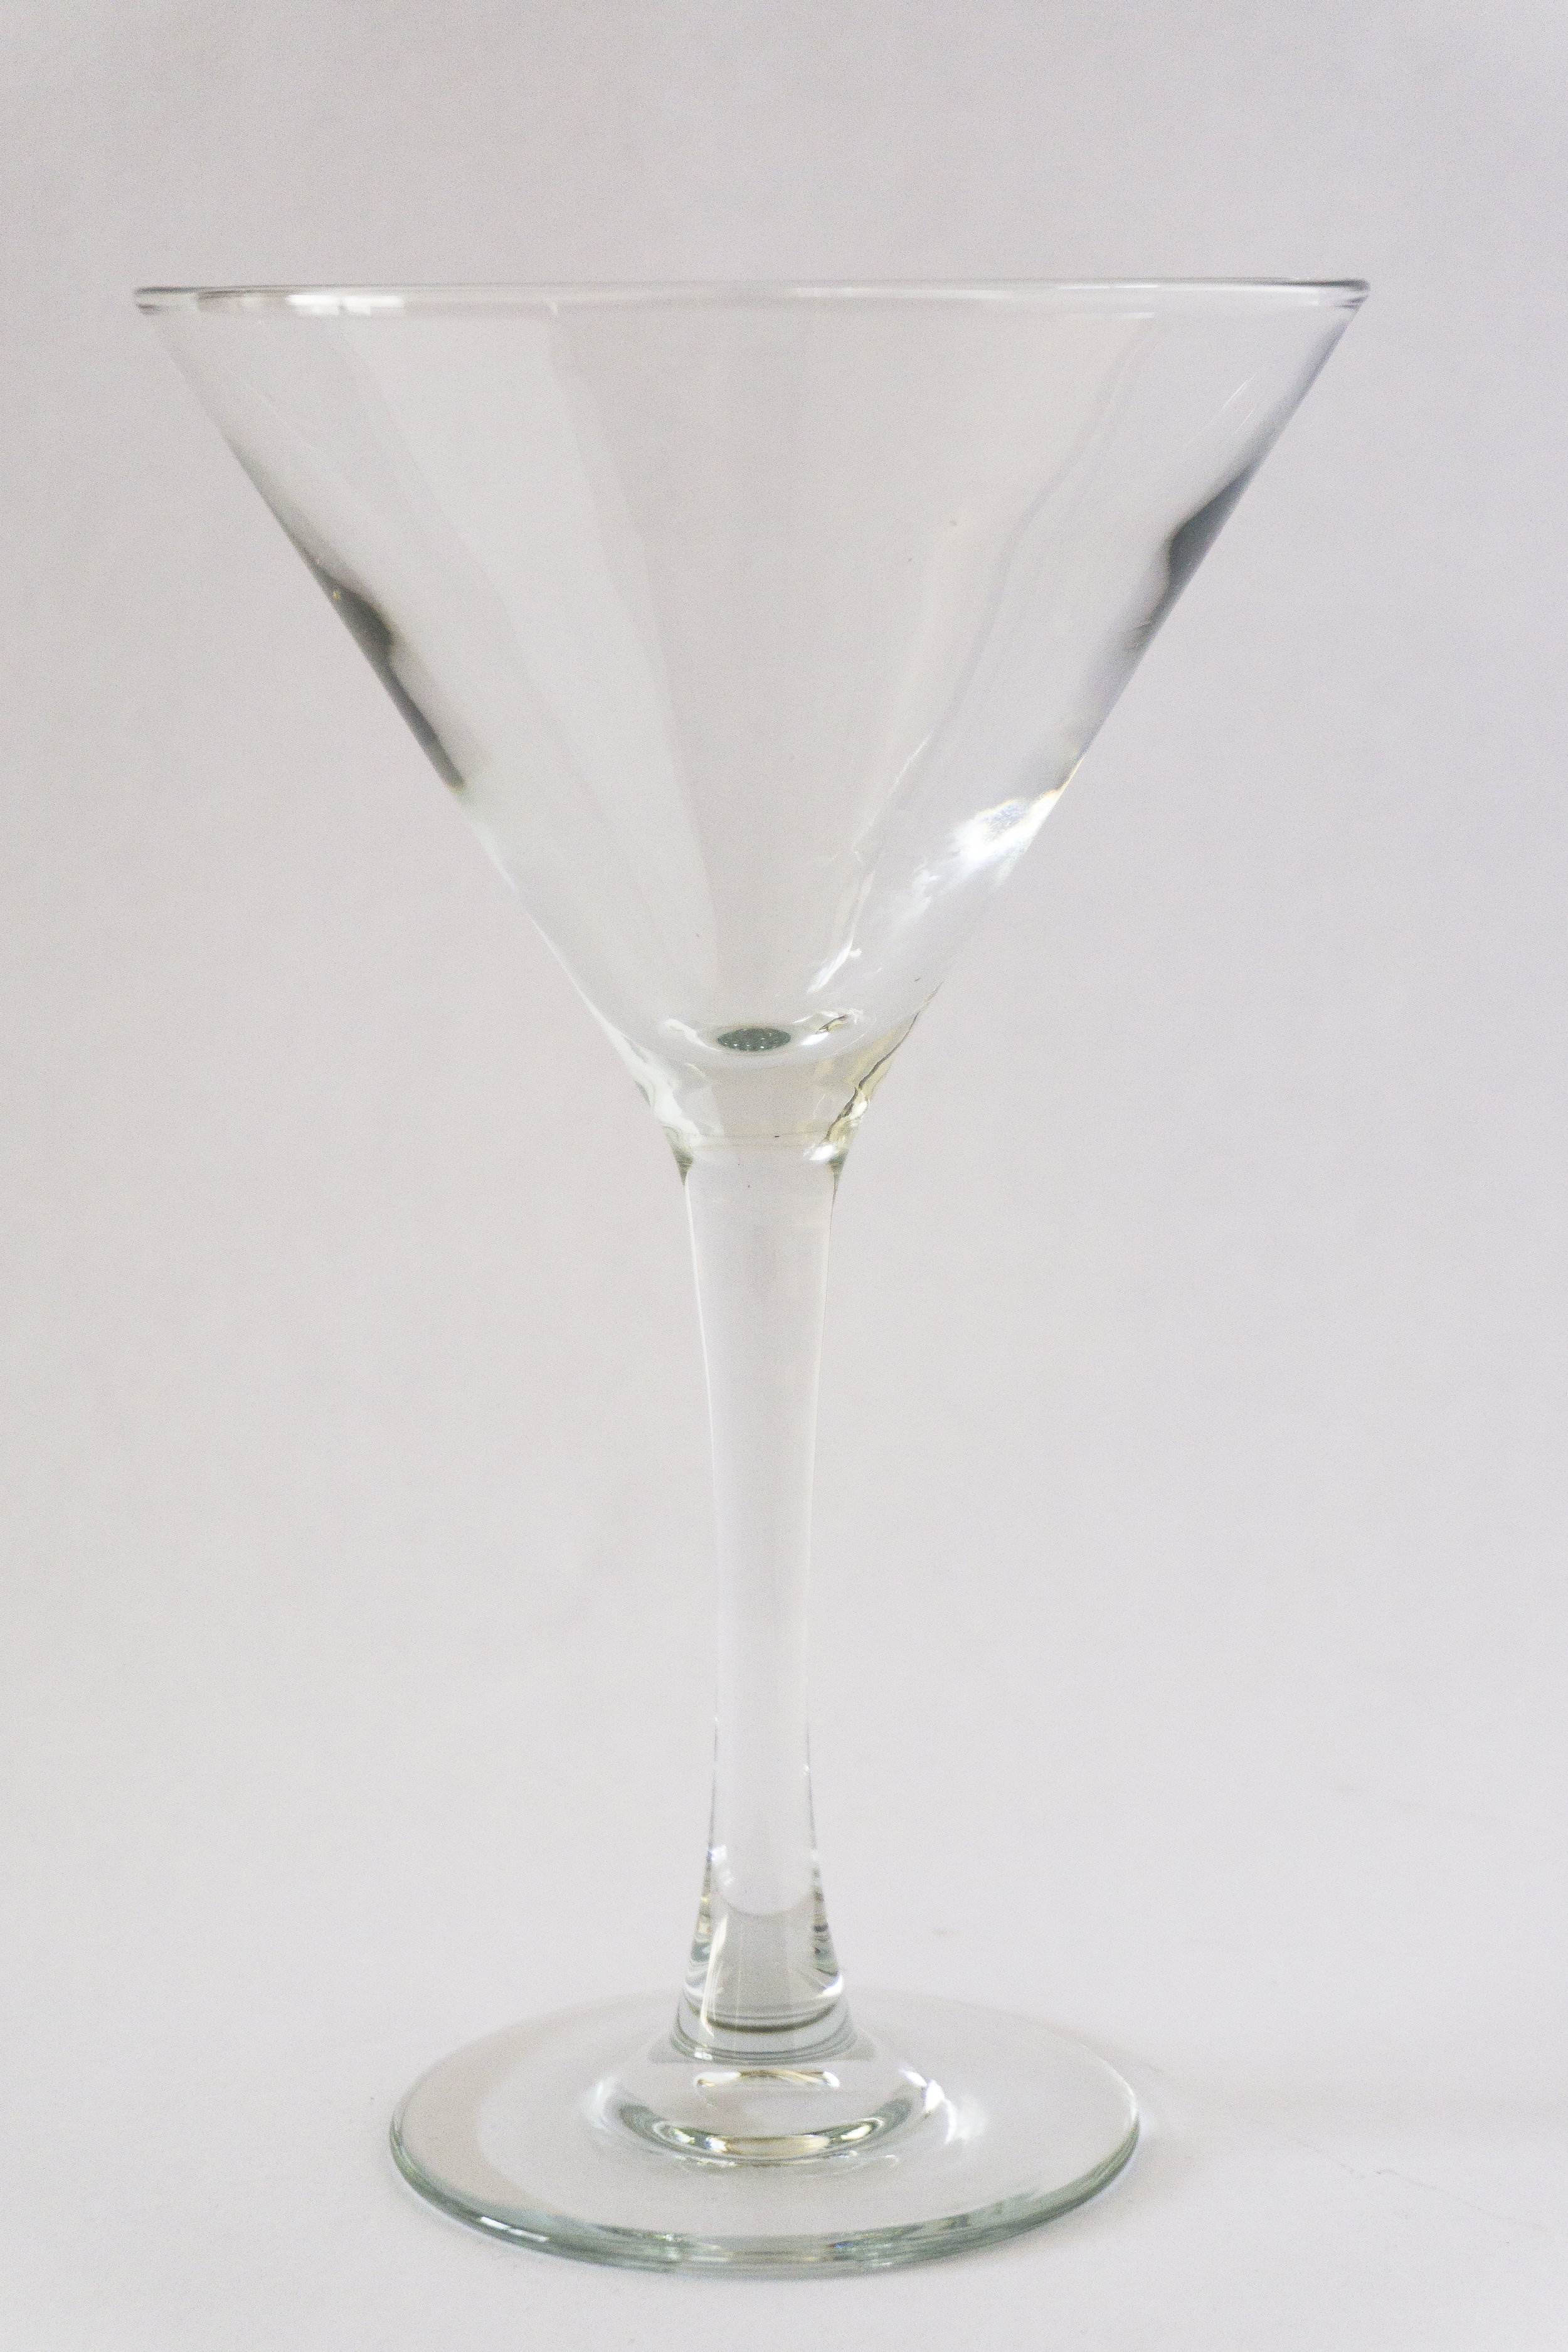 12 oz. Martini Glass  $1.15 each